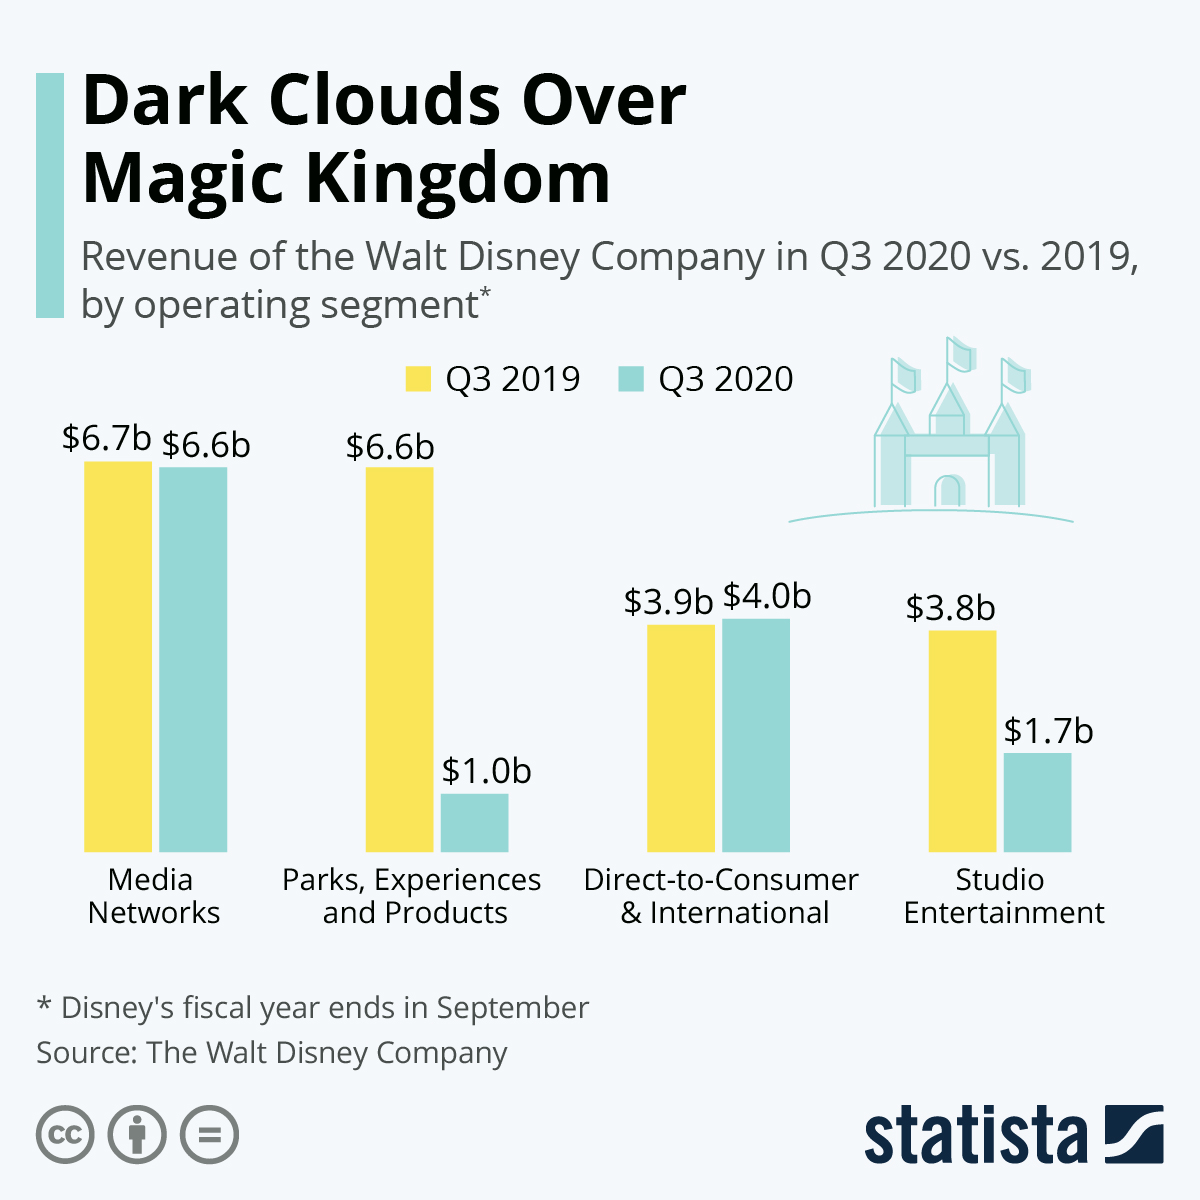 Dark Clouds Over Magic Kingdom #Infographic